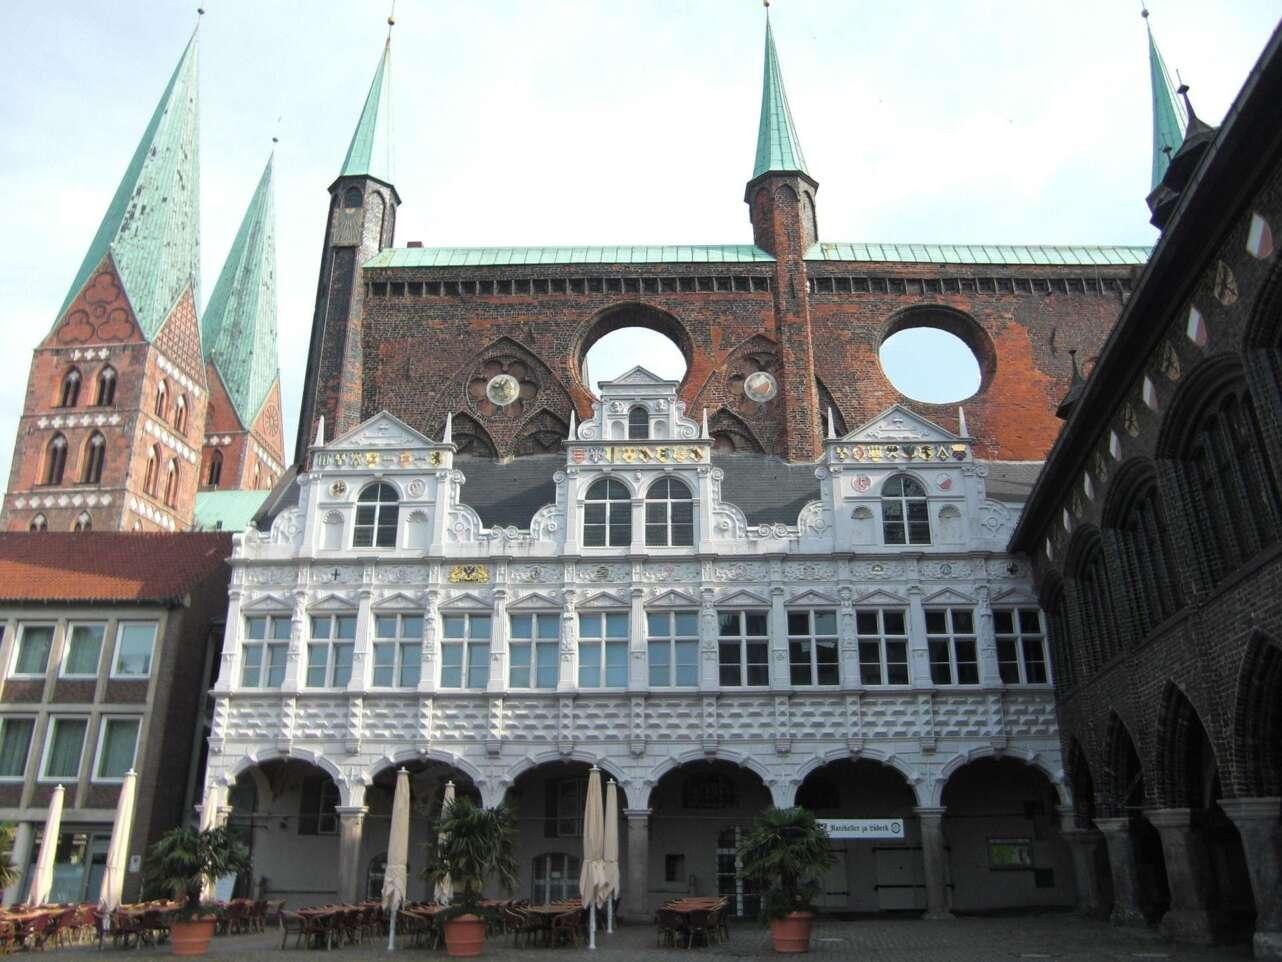 Ayuntamiento y torres de Marienkirche. Foto Jens Junge Pixabay